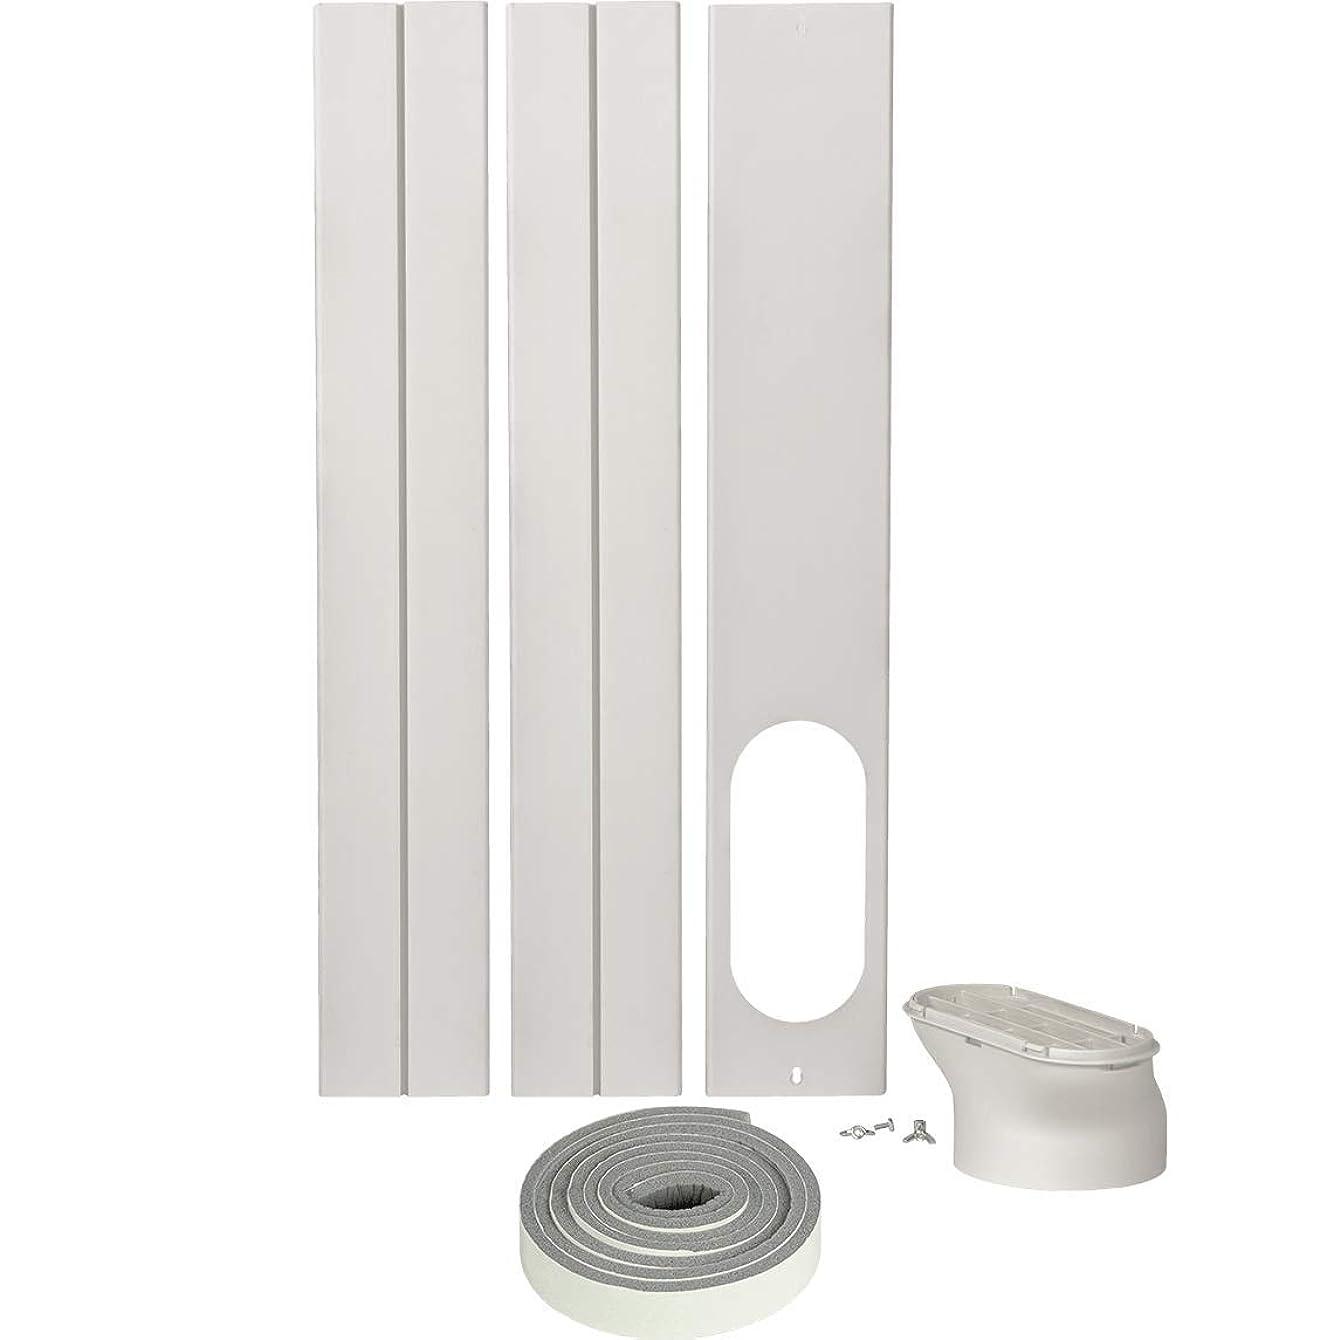 Honeywell Portable AC Sliding Glass Door Kit